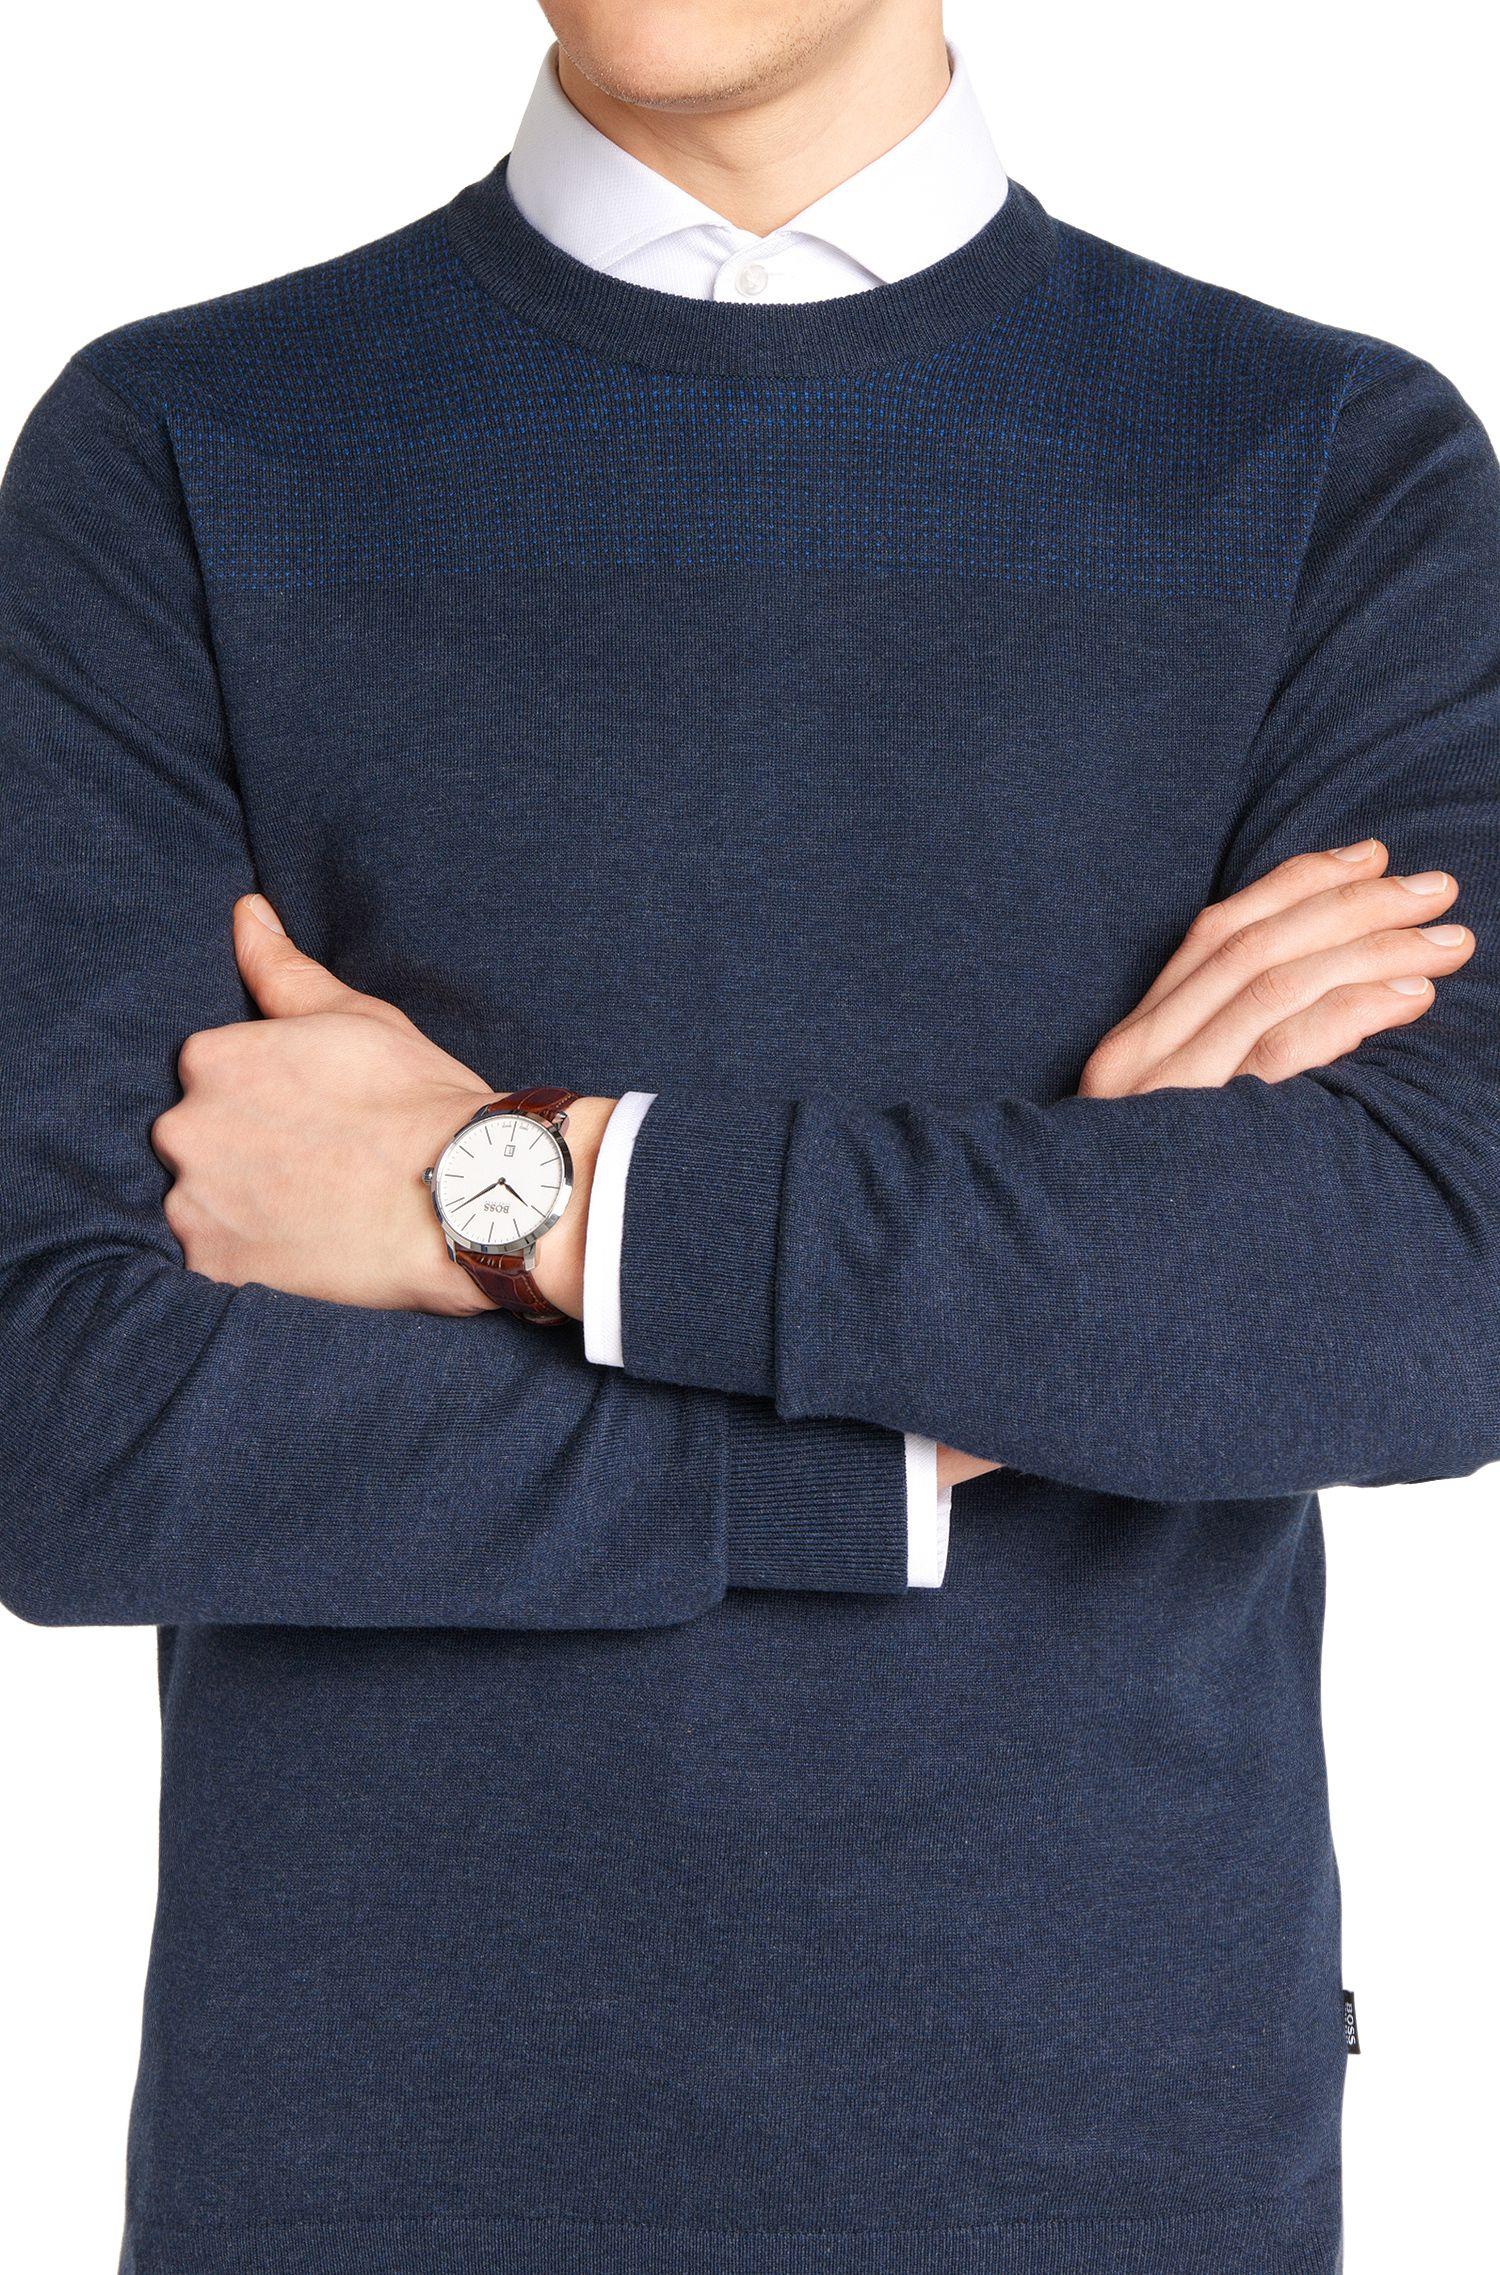 Armbanduhr aus Edelstahl mit Lederarmband: 'Signature Timepiece'